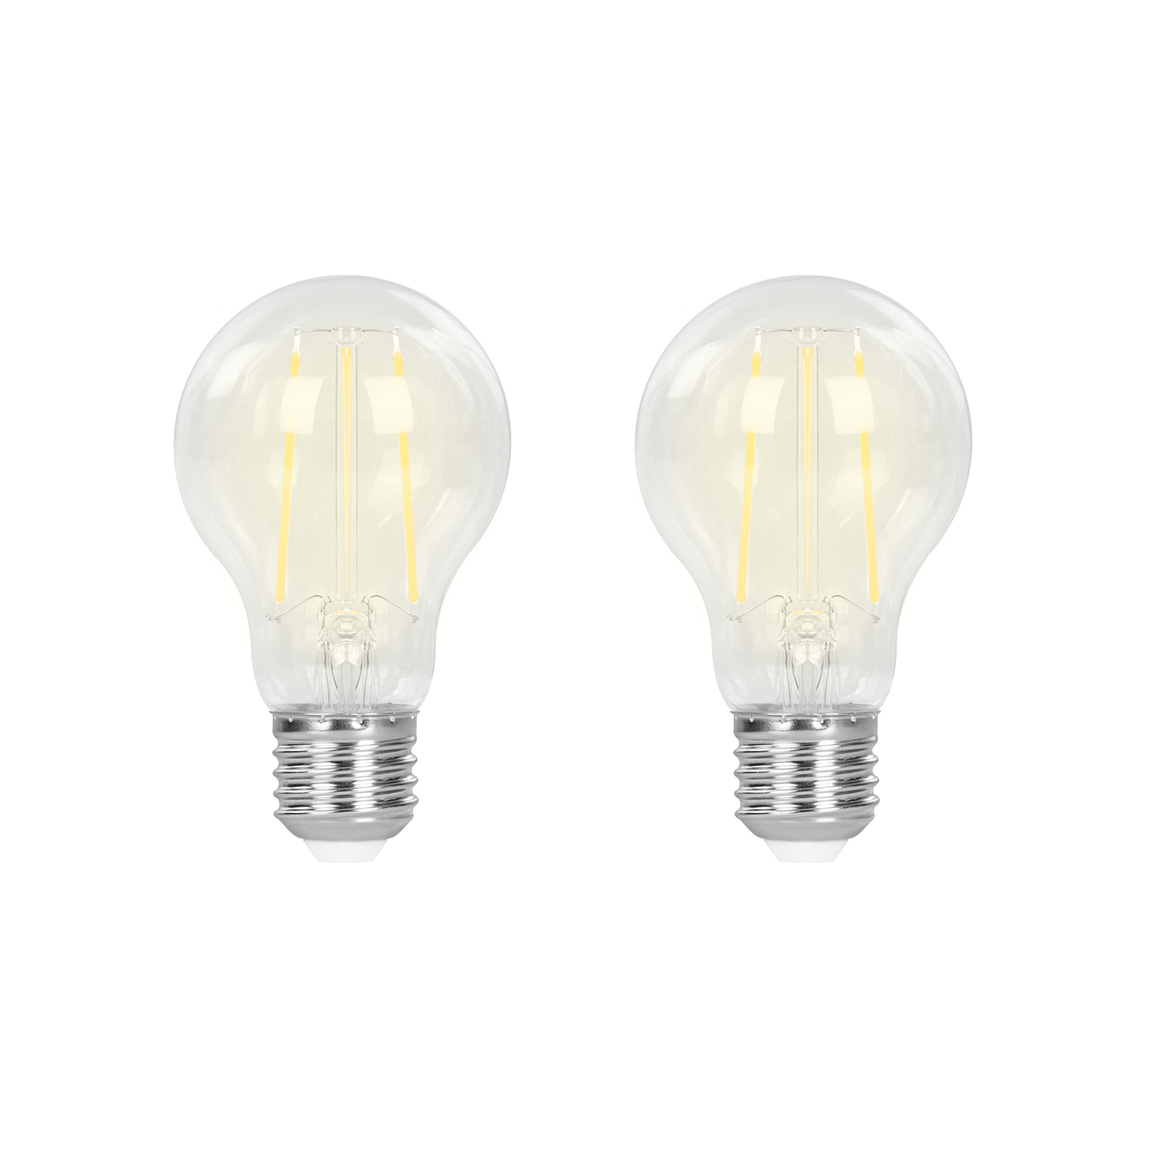 Hombli Smart Bulb E27 Filament 2er-Set